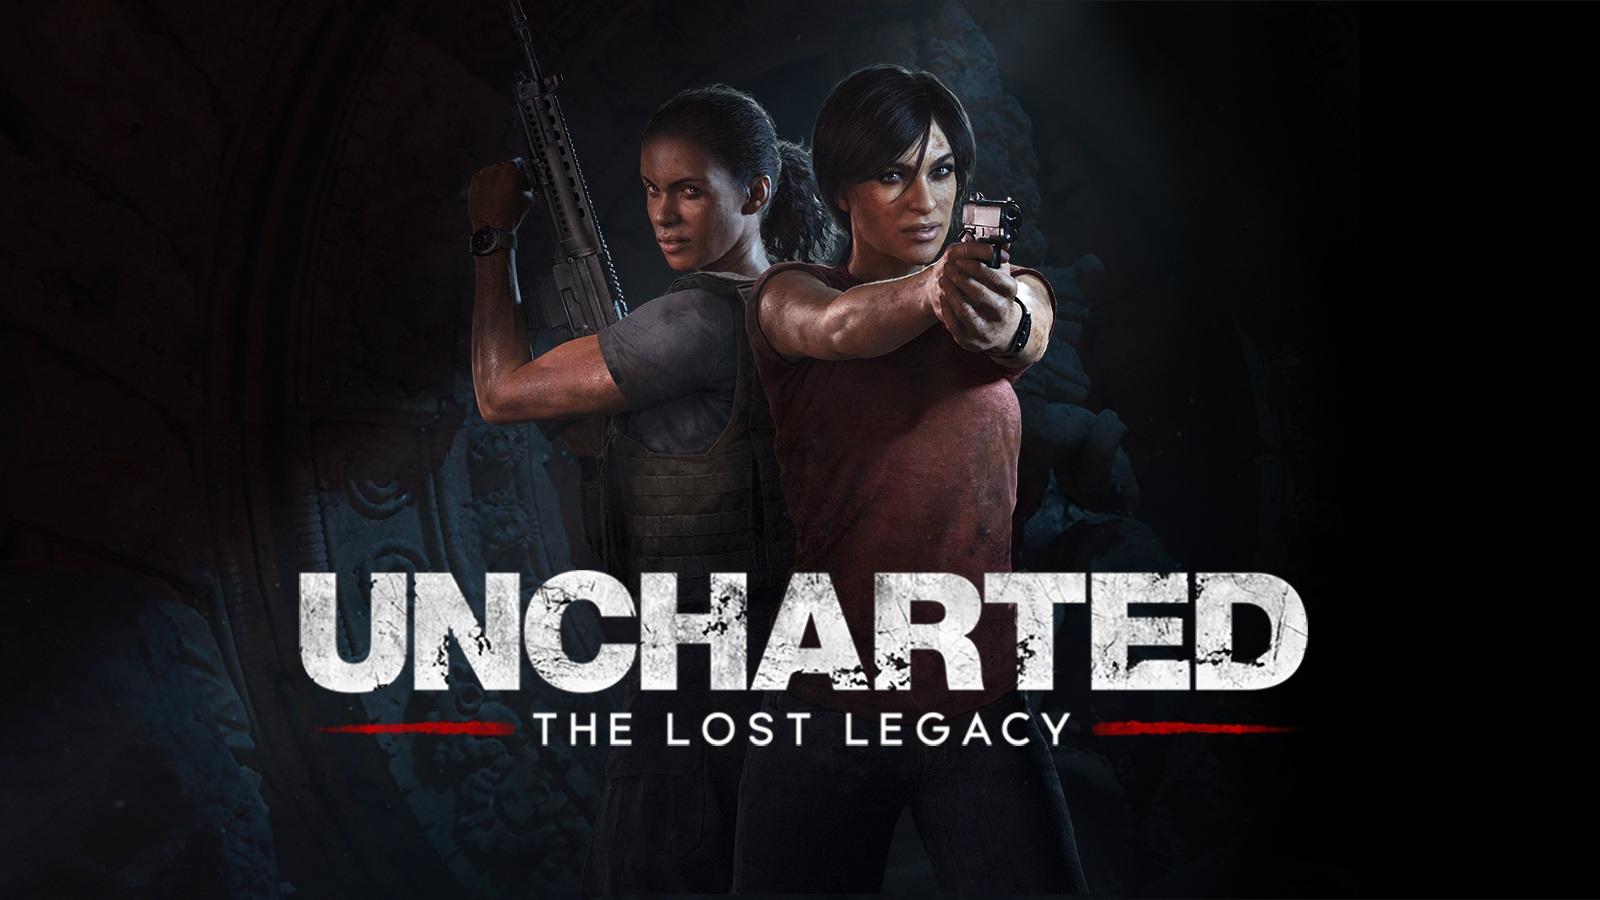 نمرات عنوان Uncharted: The Lost Legacy منتشر شد